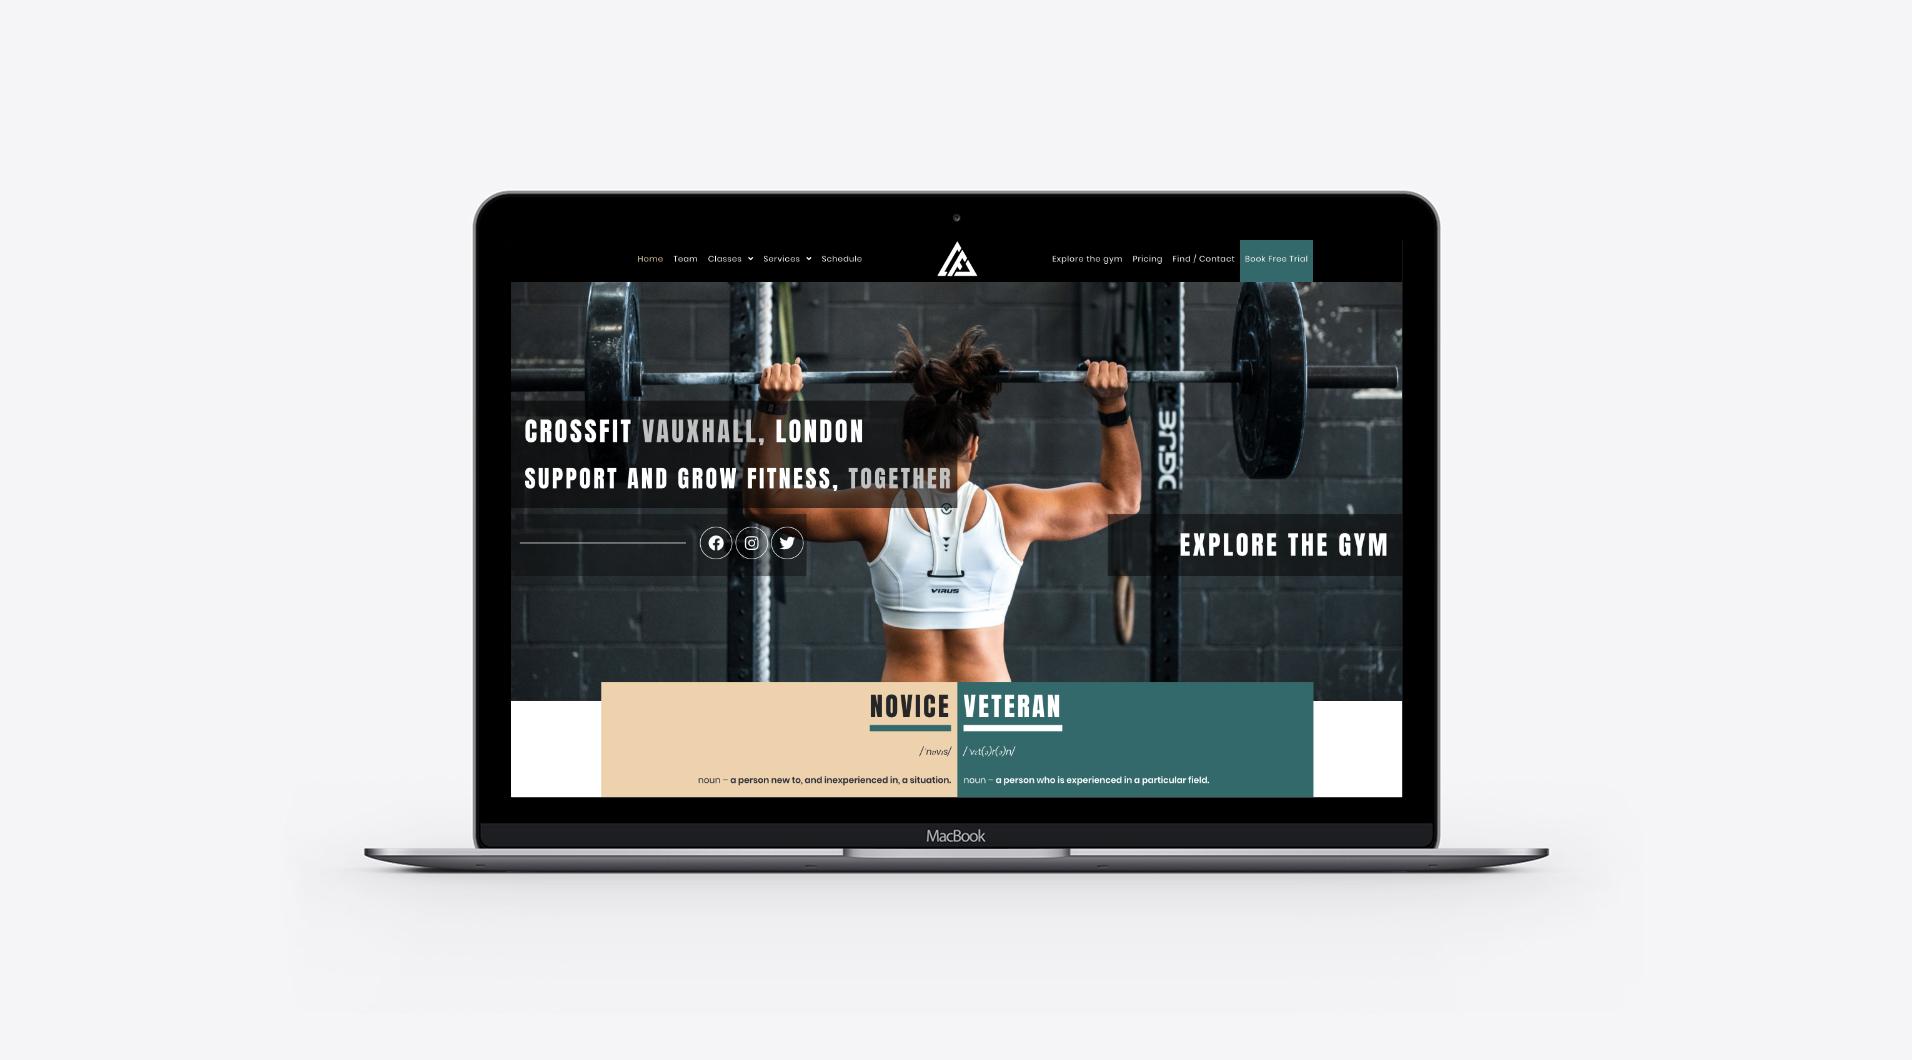 London crossfit gym